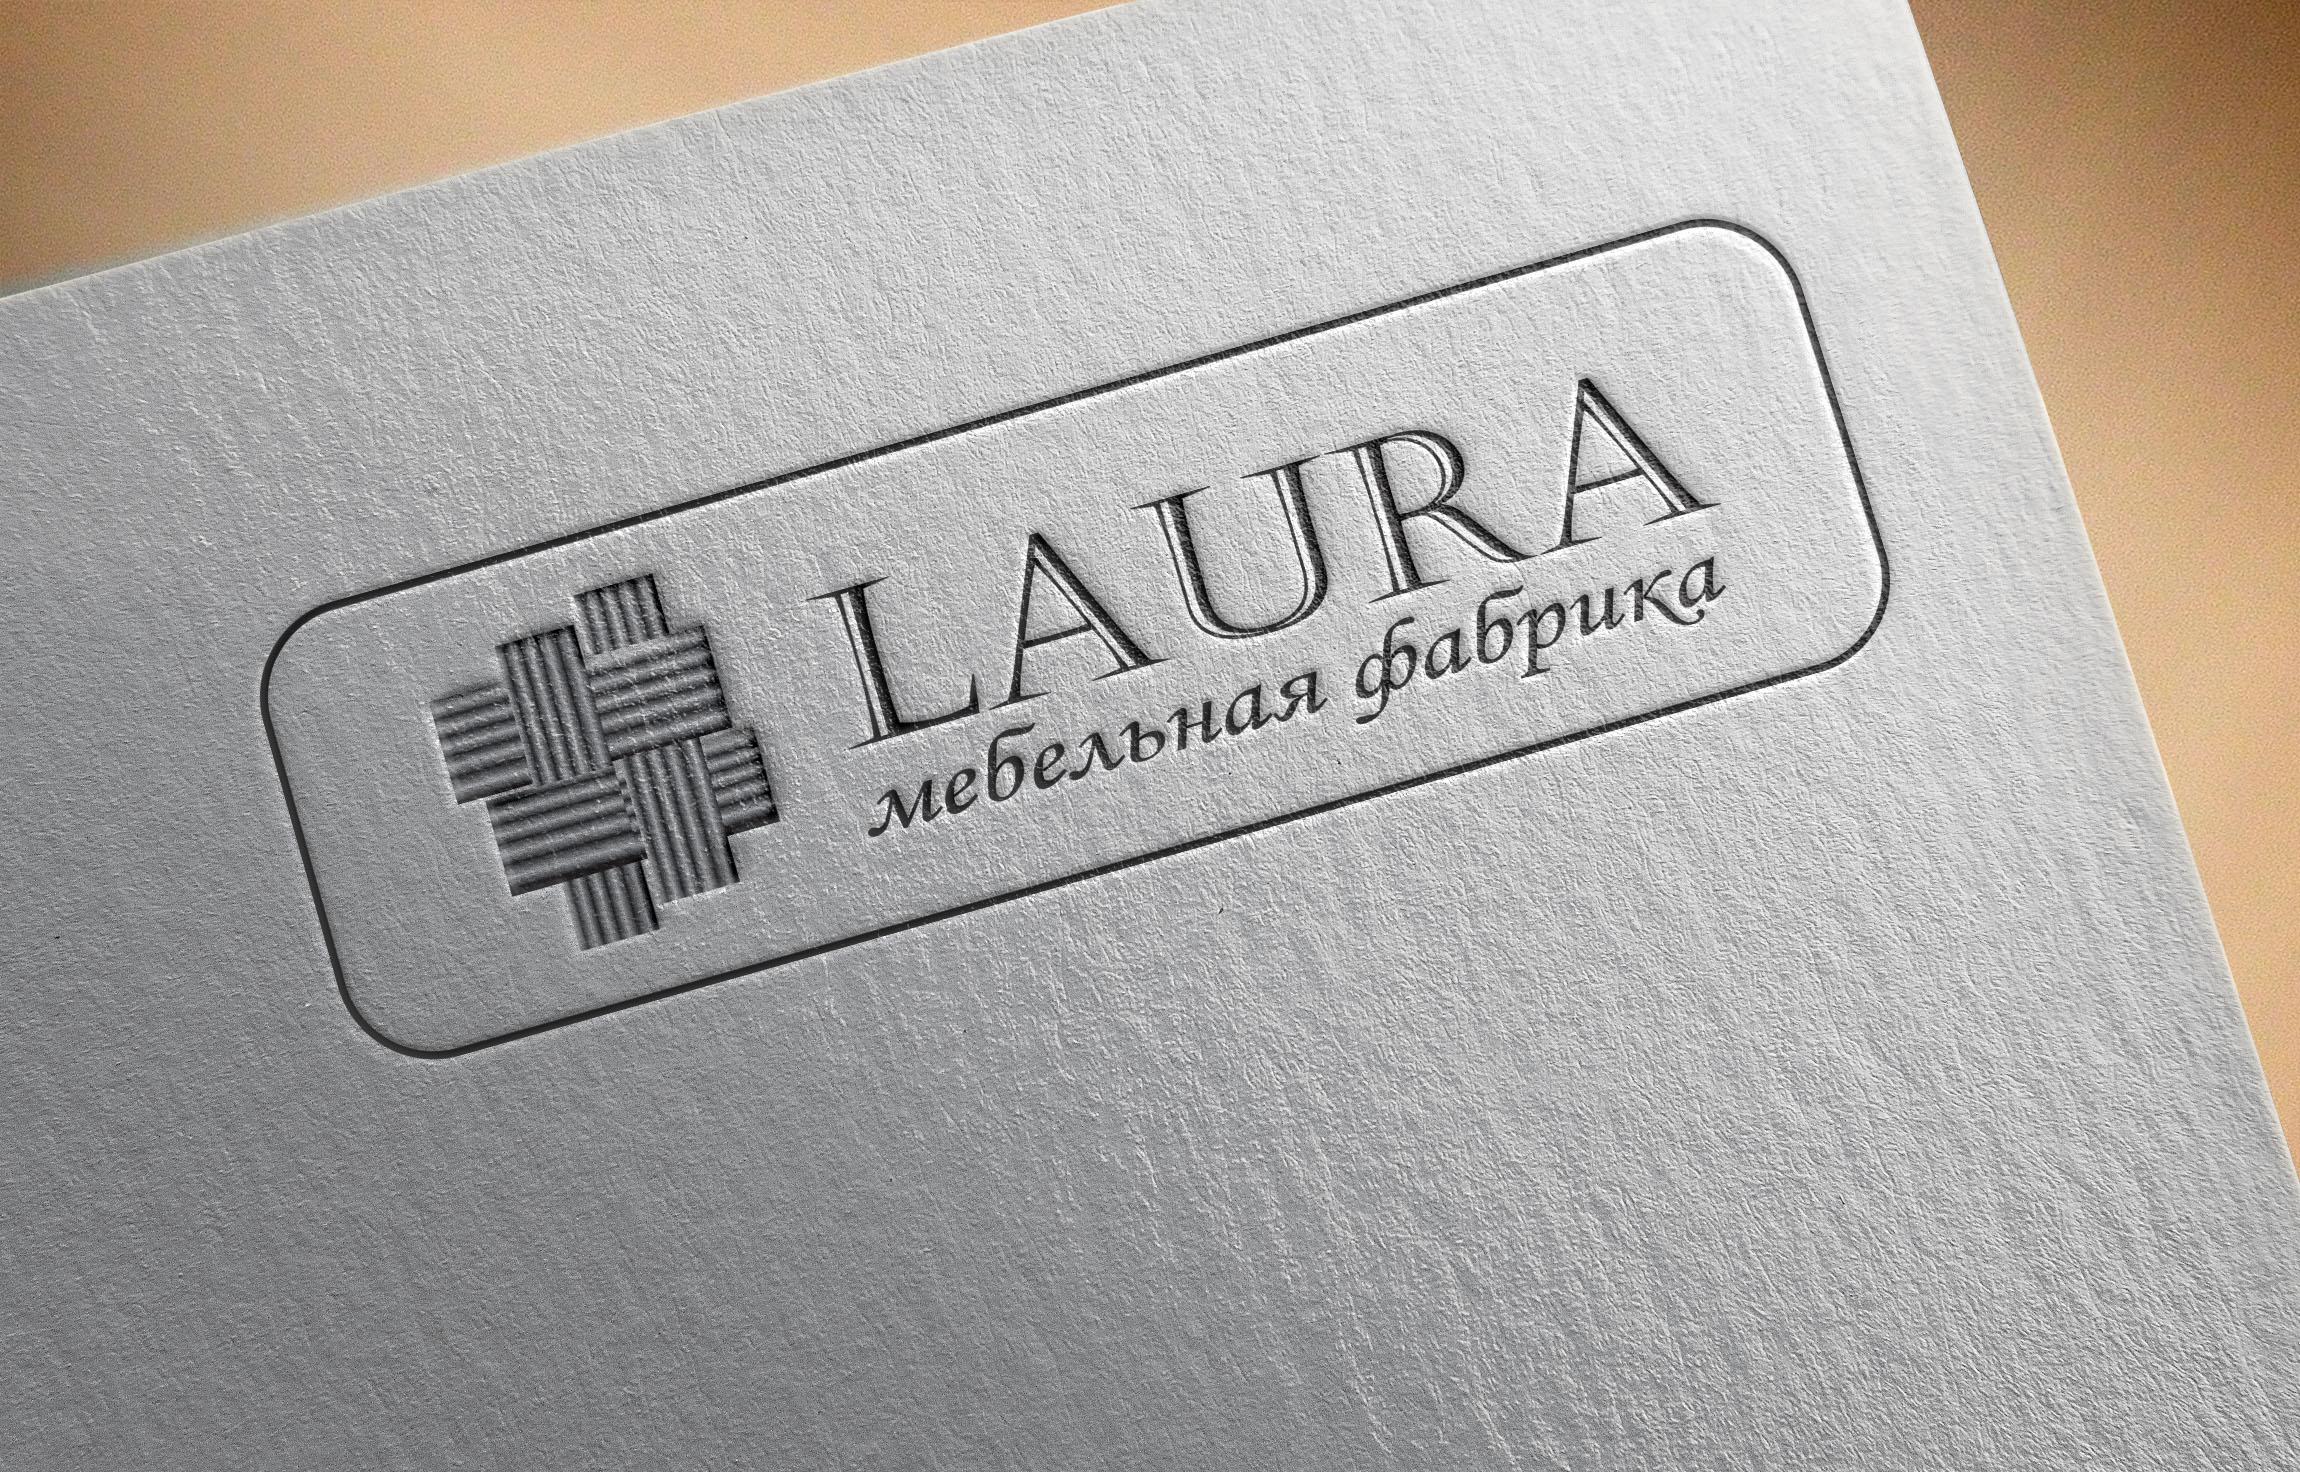 Разработать логотип для фабрики мебели фото f_12759b9899b99333.jpg